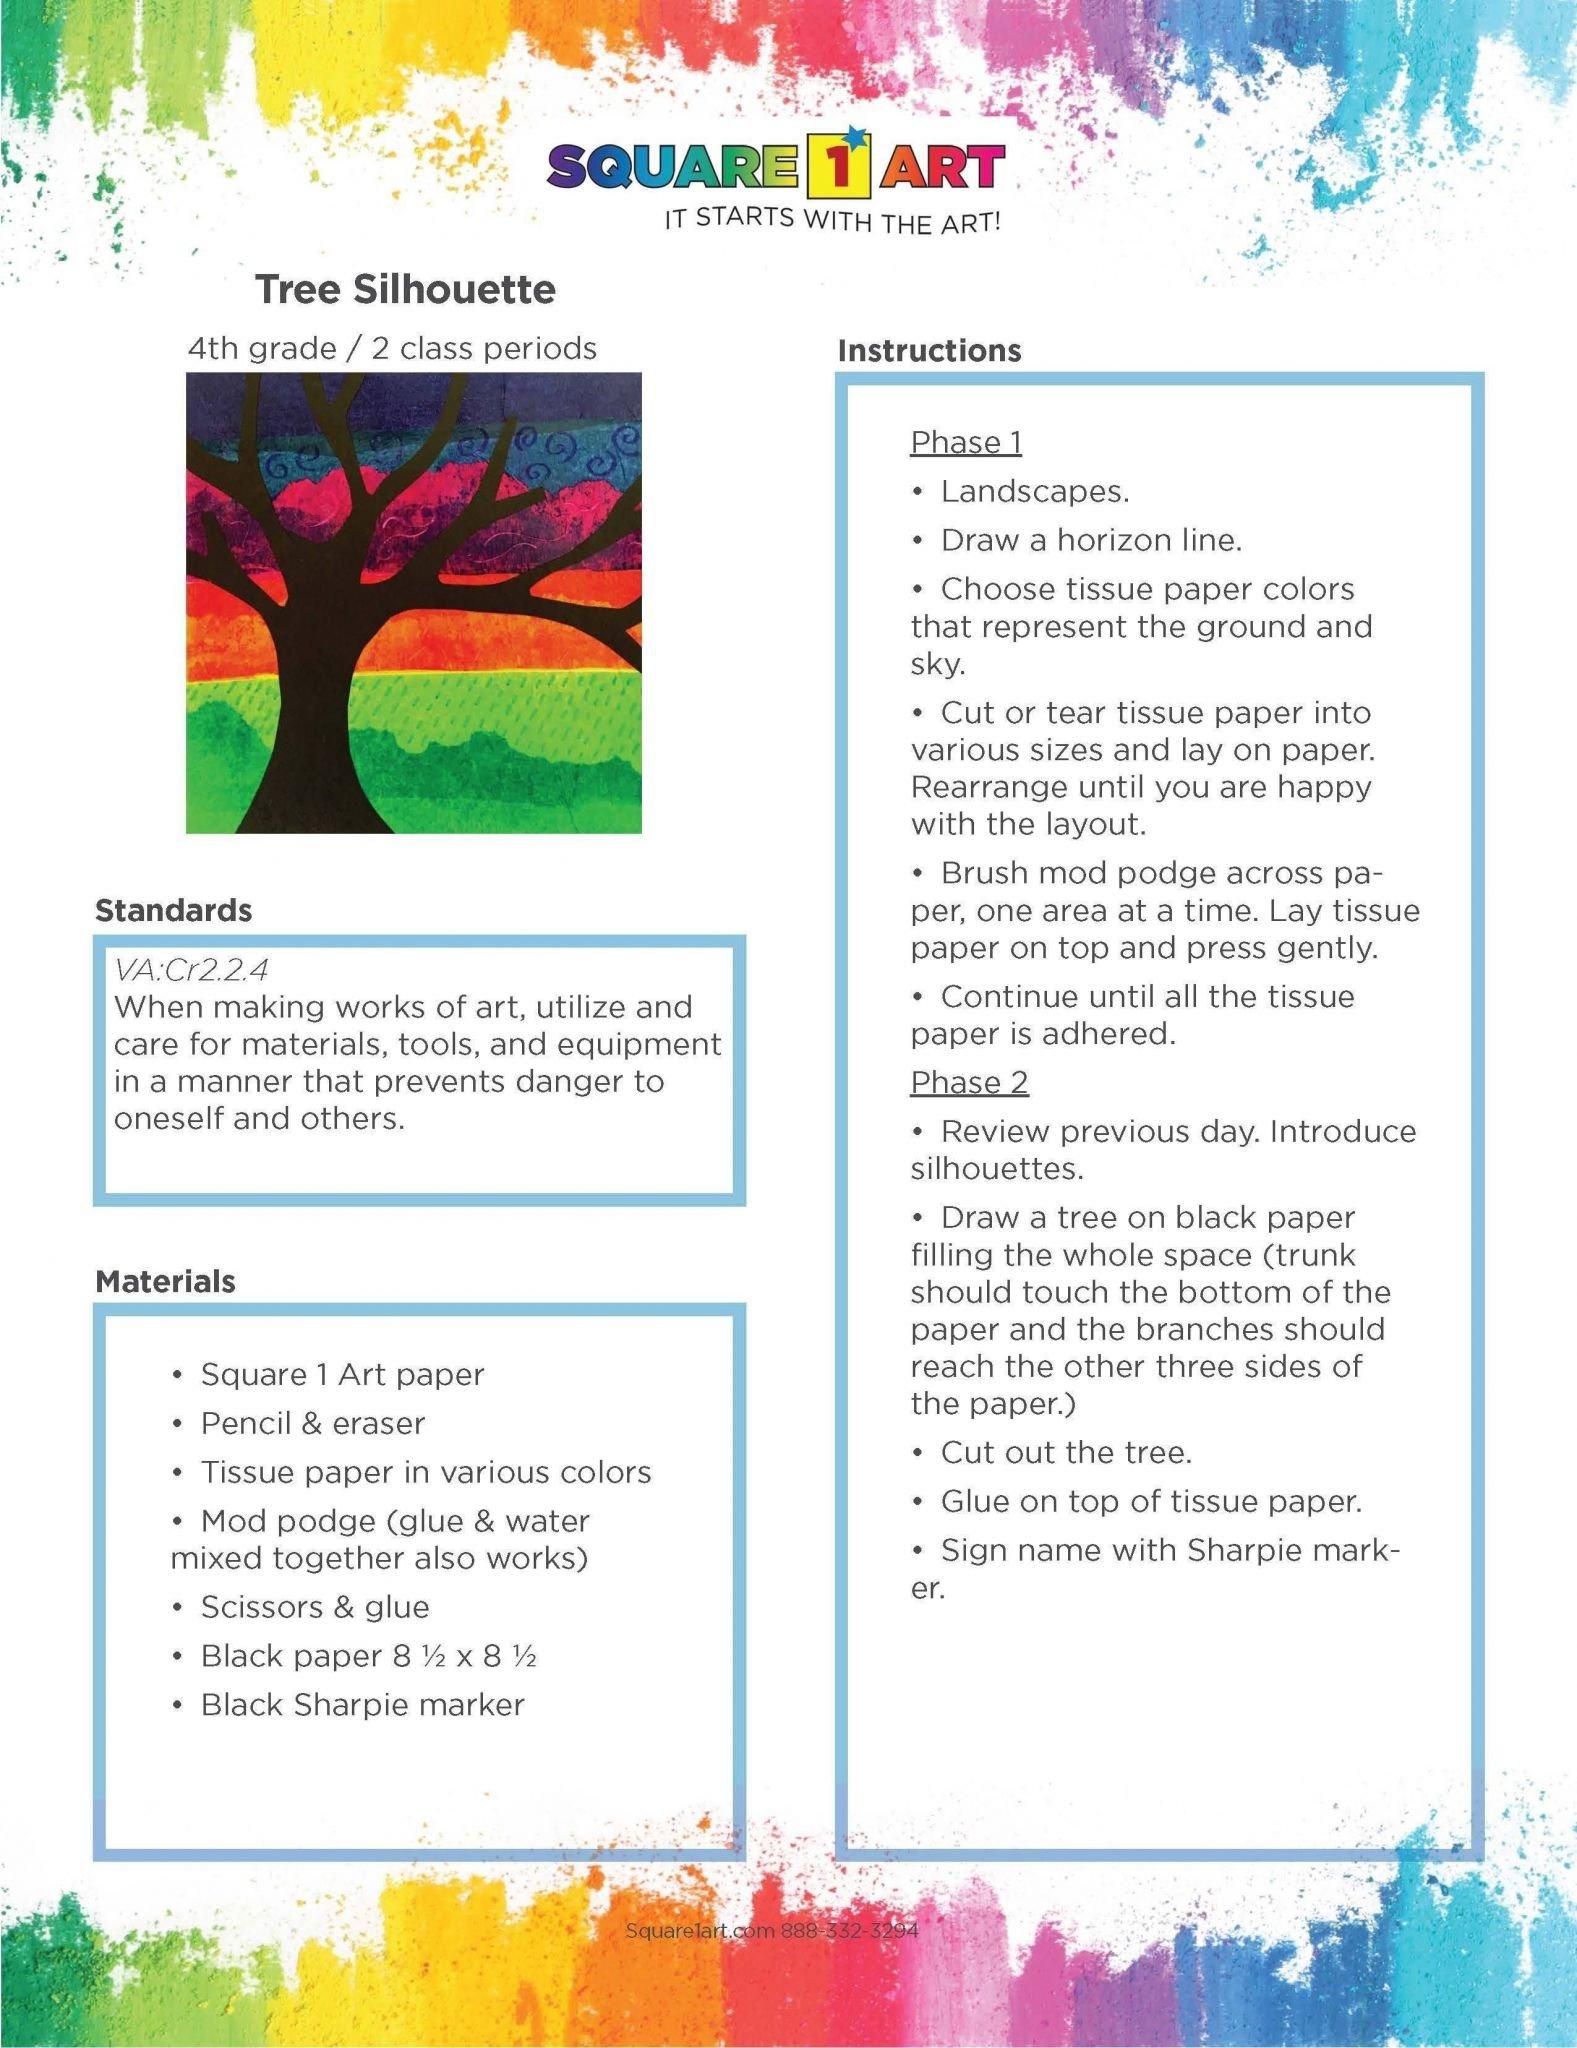 Slope Formula Worksheet  Briefencounters And Va Maximum Loan Amount Calculation Worksheet 2018